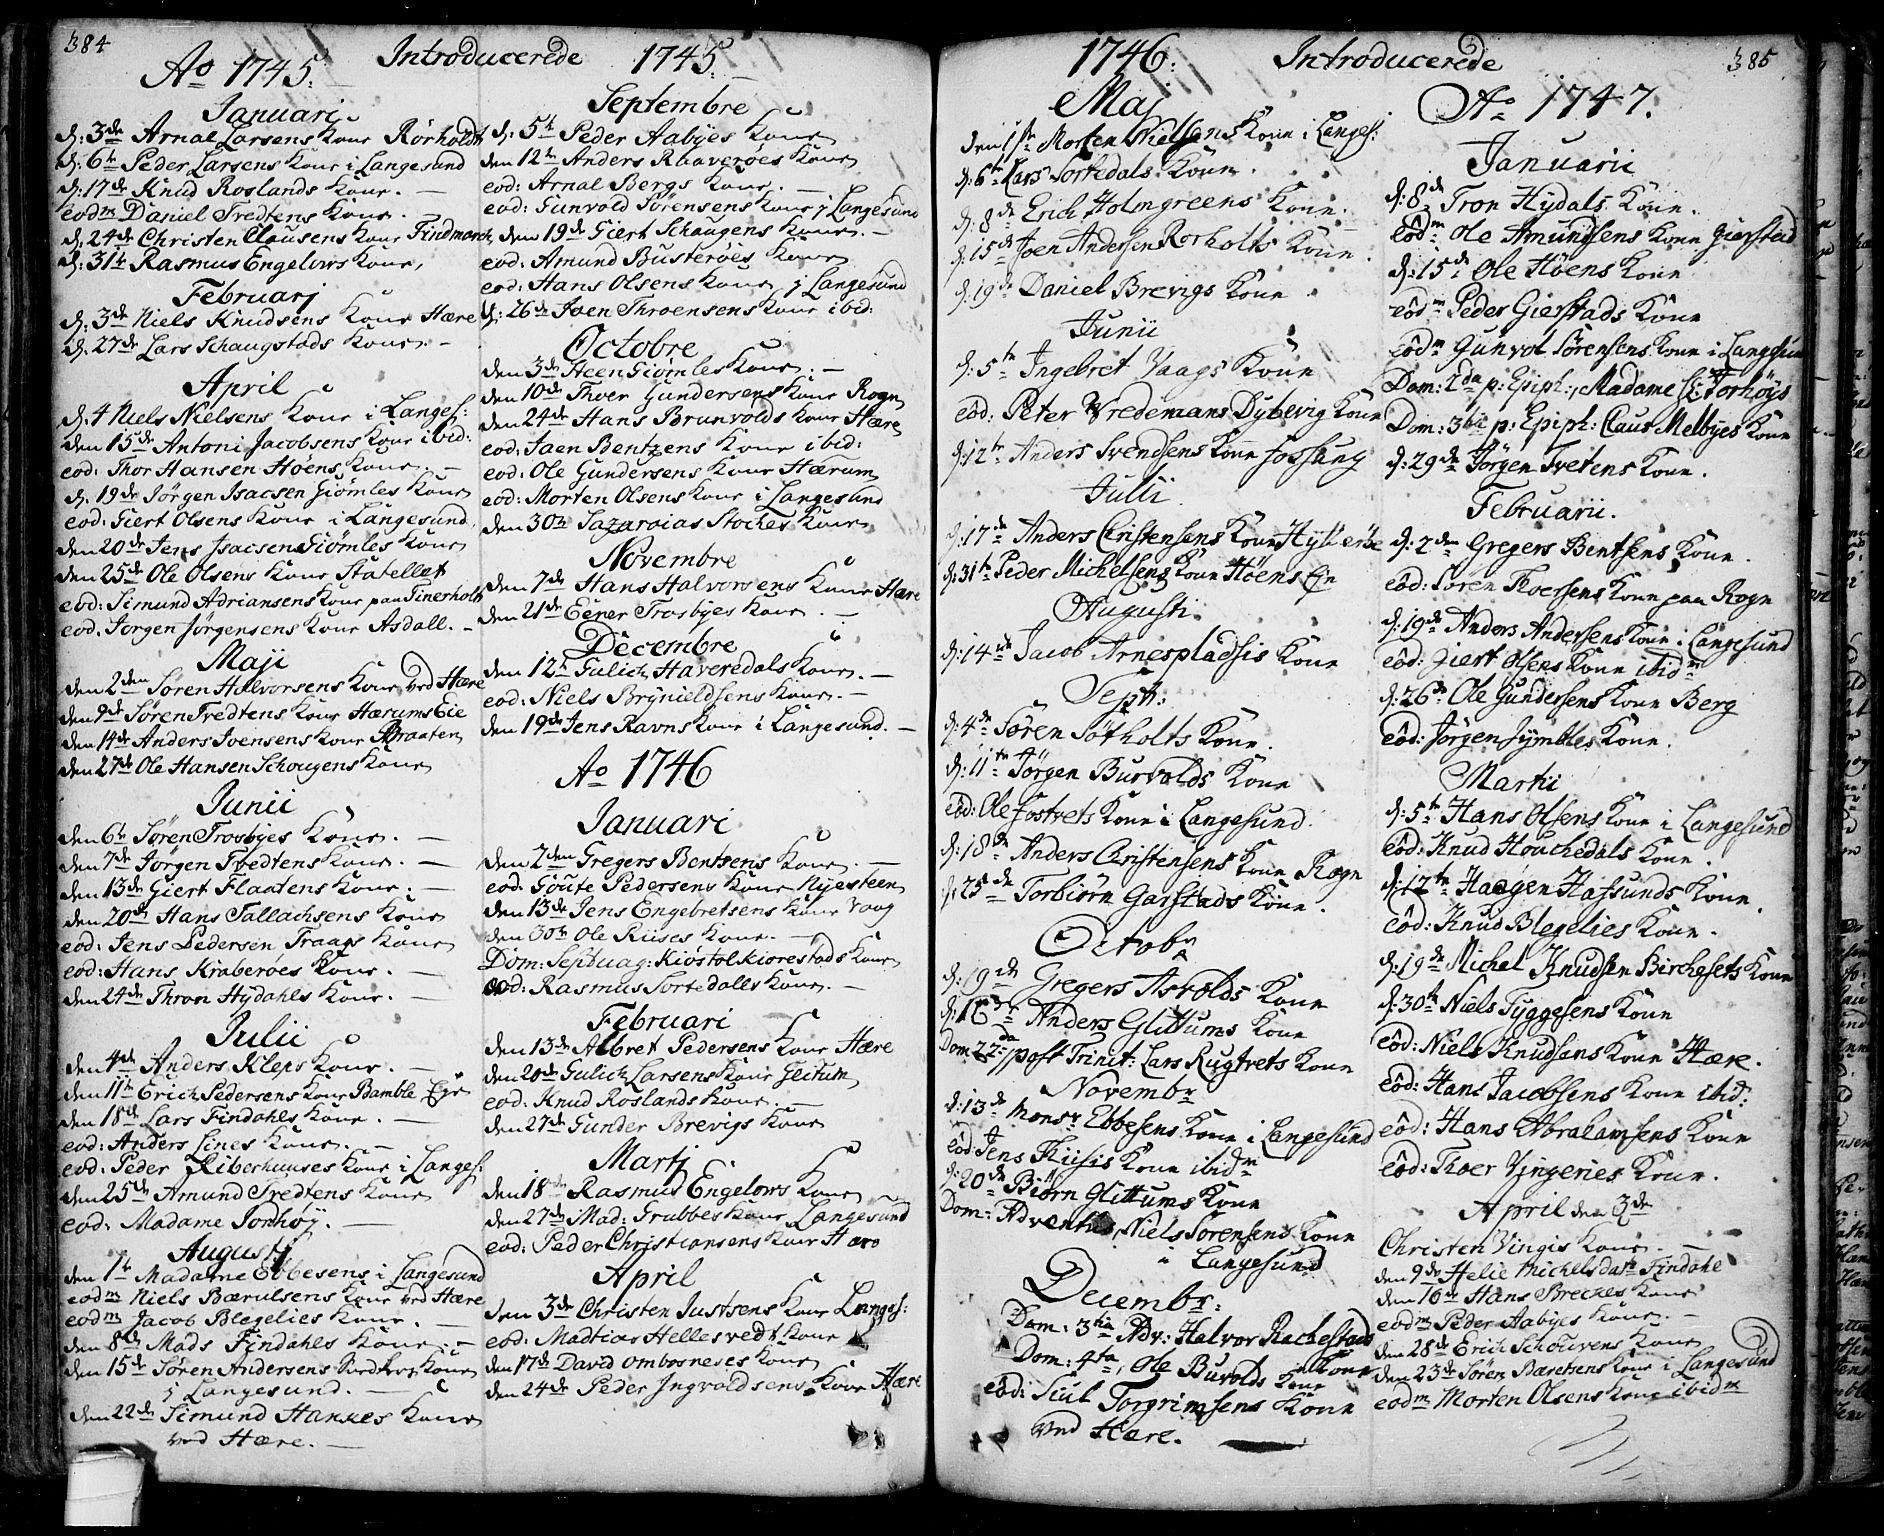 SAKO, Bamble kirkebøker, F/Fa/L0001: Ministerialbok nr. I 1, 1702-1774, s. 384-385